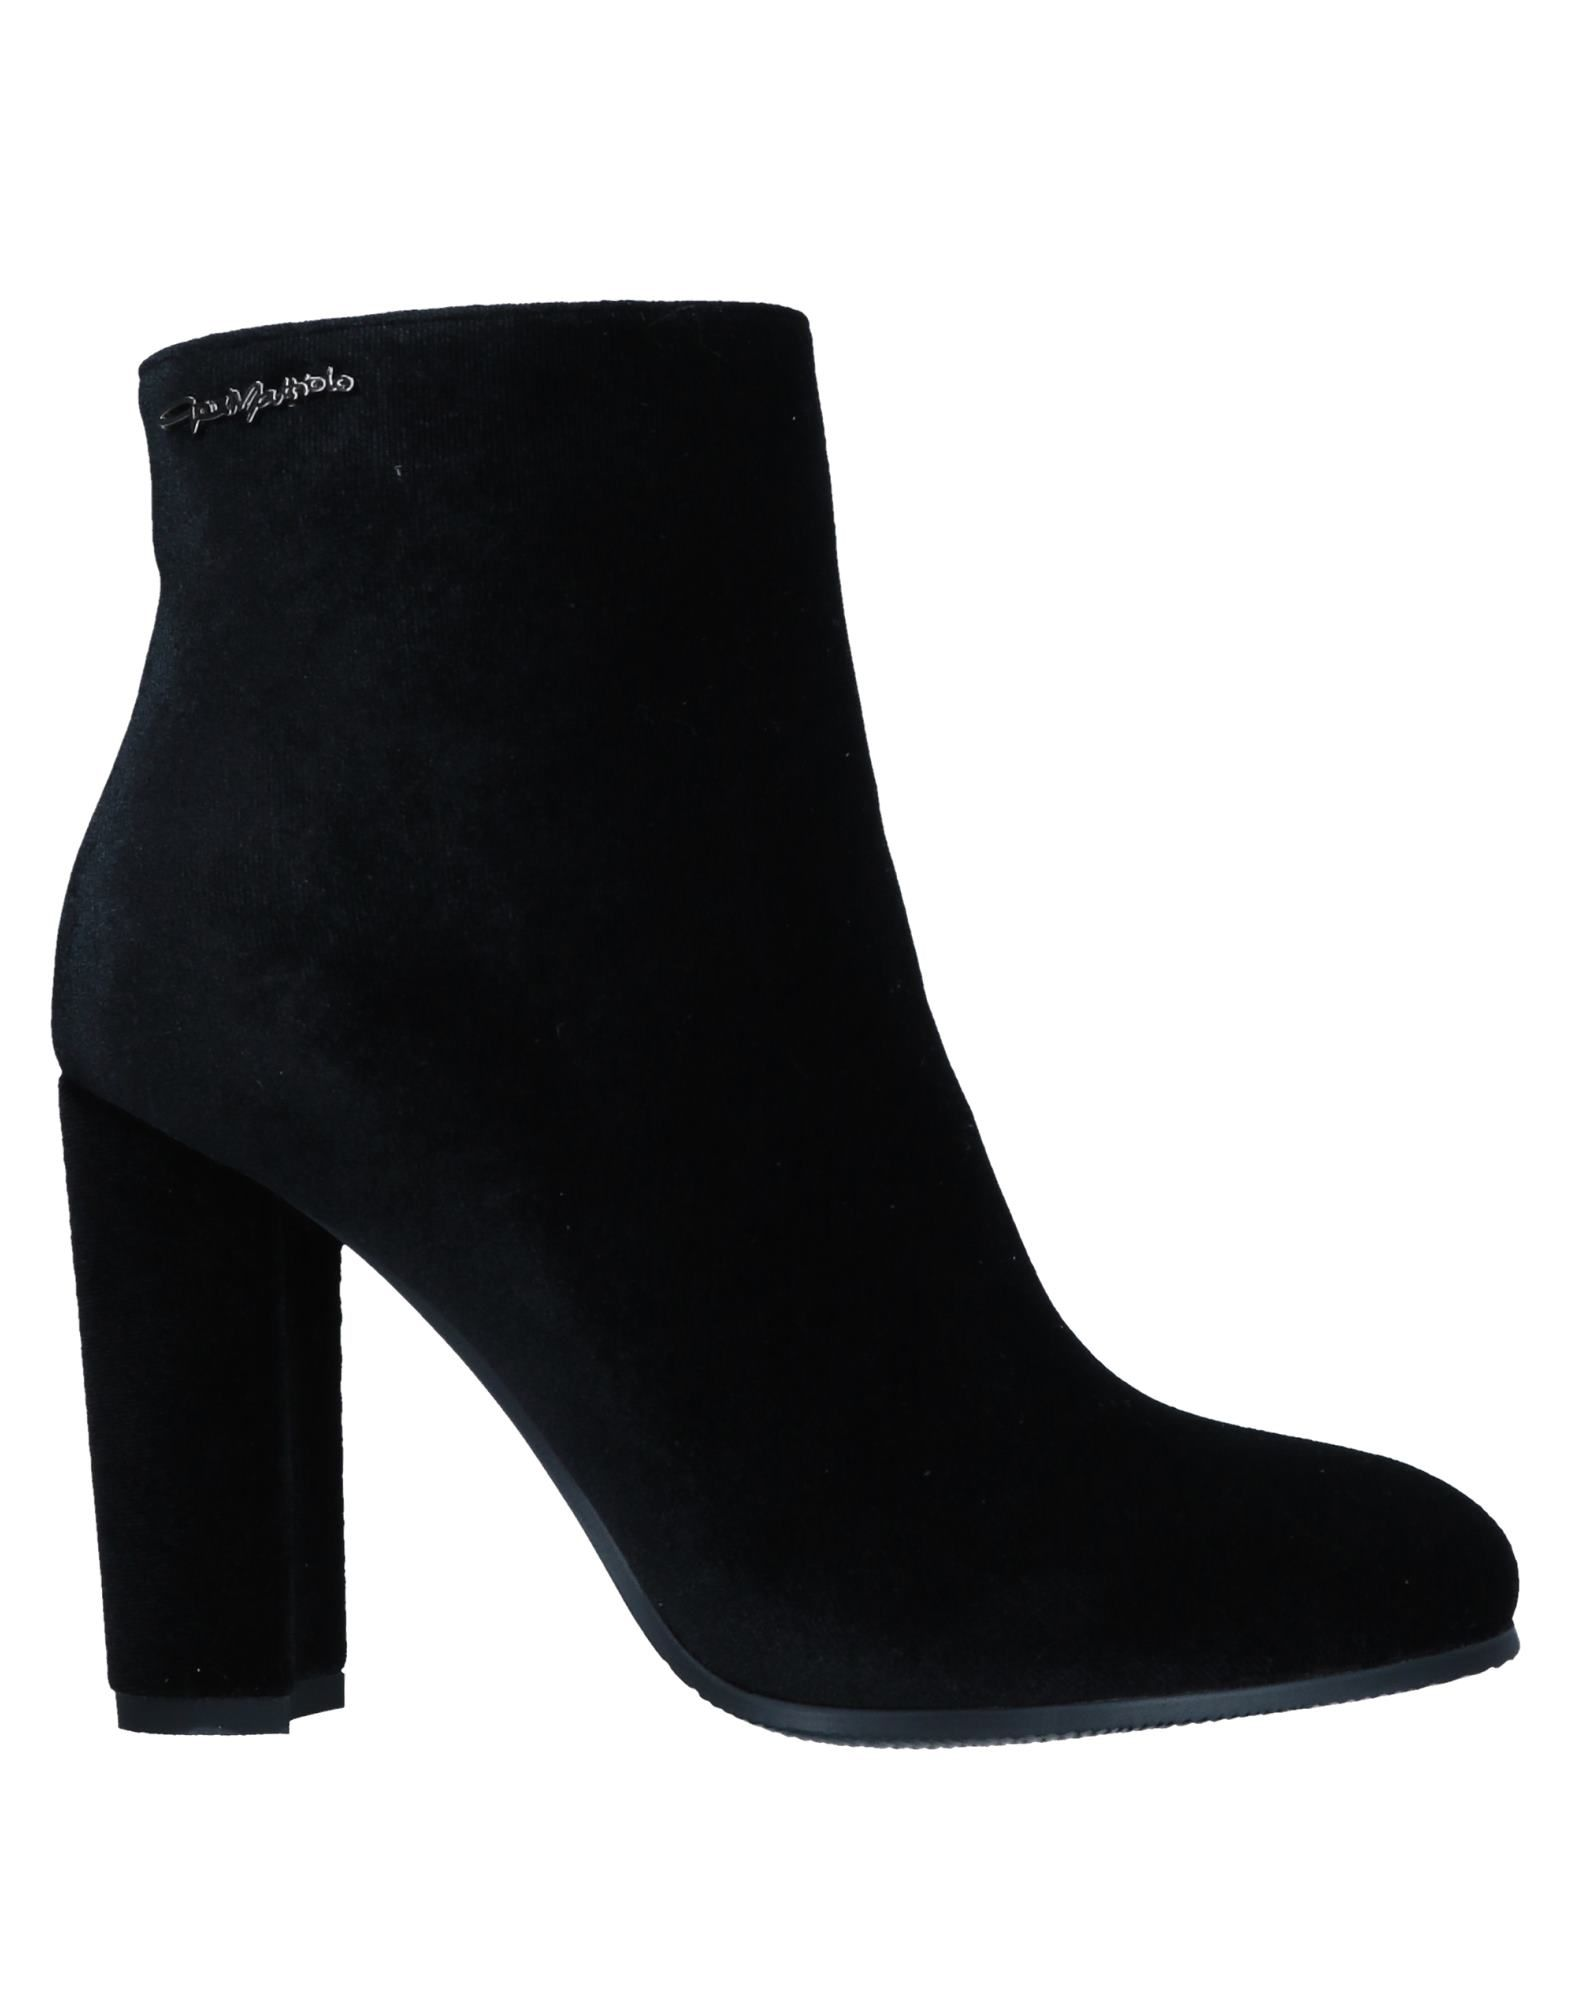 Gai Mattiolo Ankle Boot - Women Mattiolo Gai Mattiolo Women Ankle Boots online on  Australia - 11546686LM 646bca